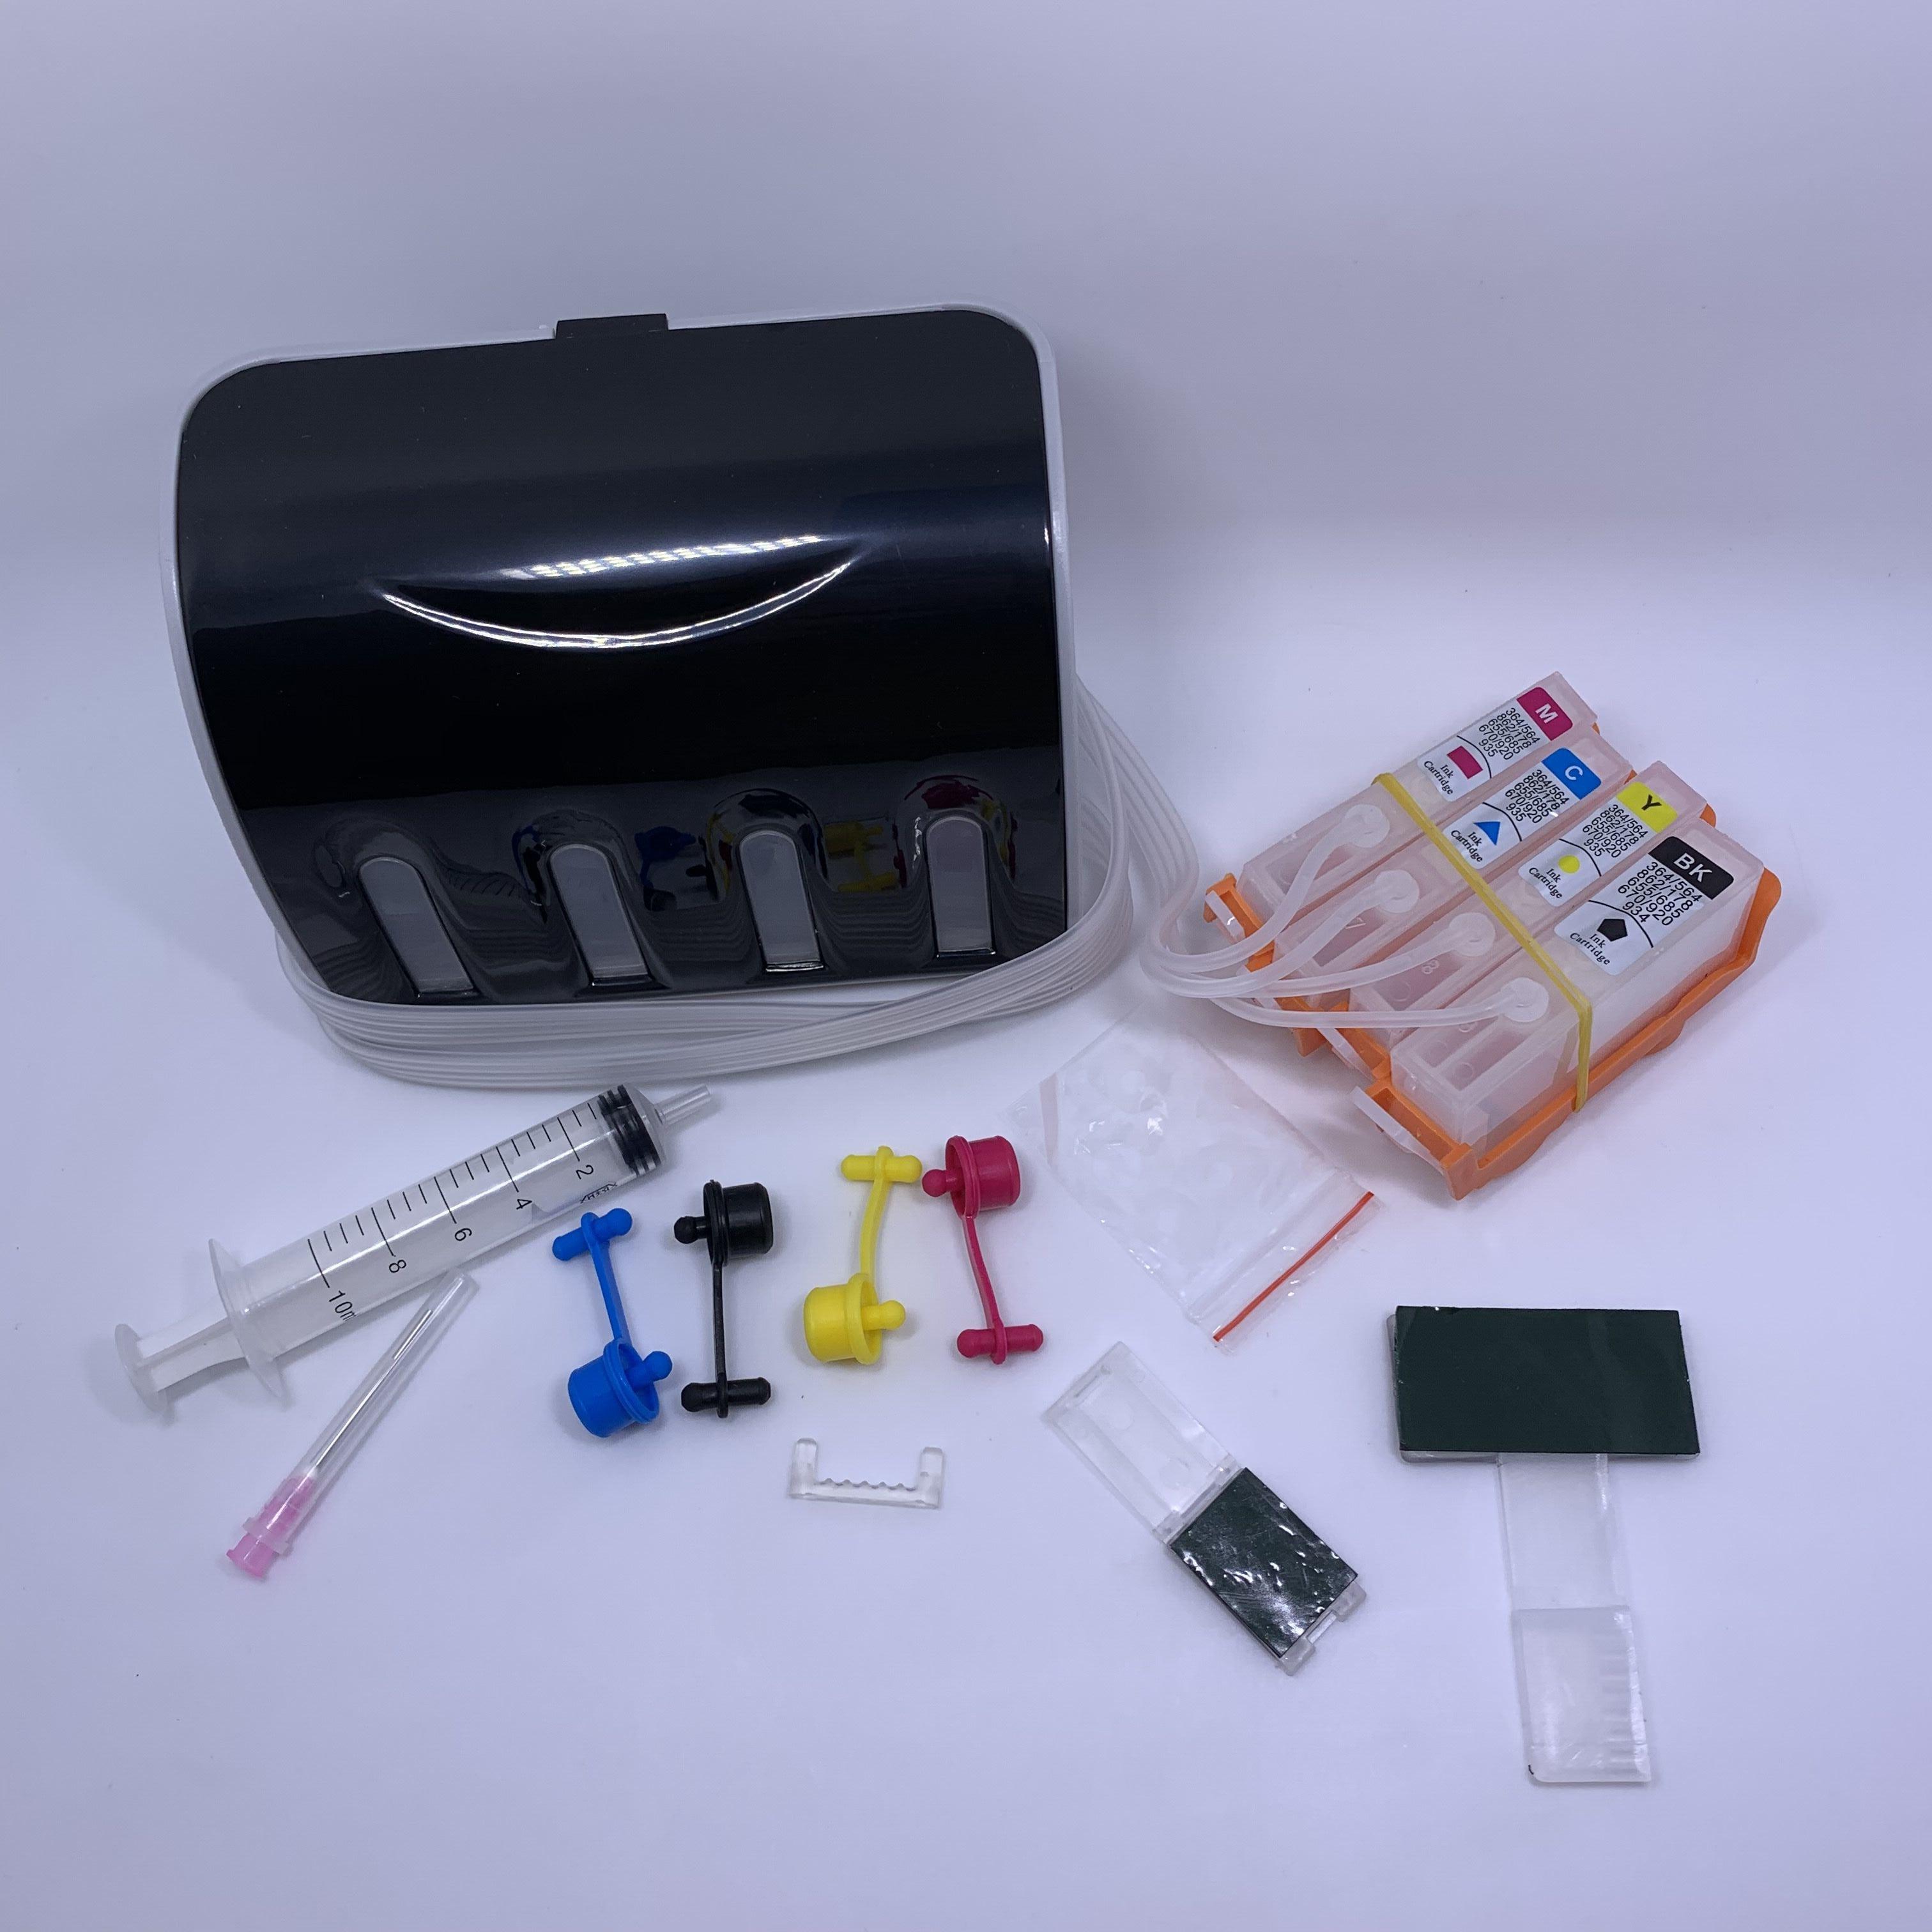 Cartucho de tinta CISS YOTAT 1set para HP364 HP 364 para impresora HP Deskjet 3070A B209A B210A 5510 5515 6510 B109A